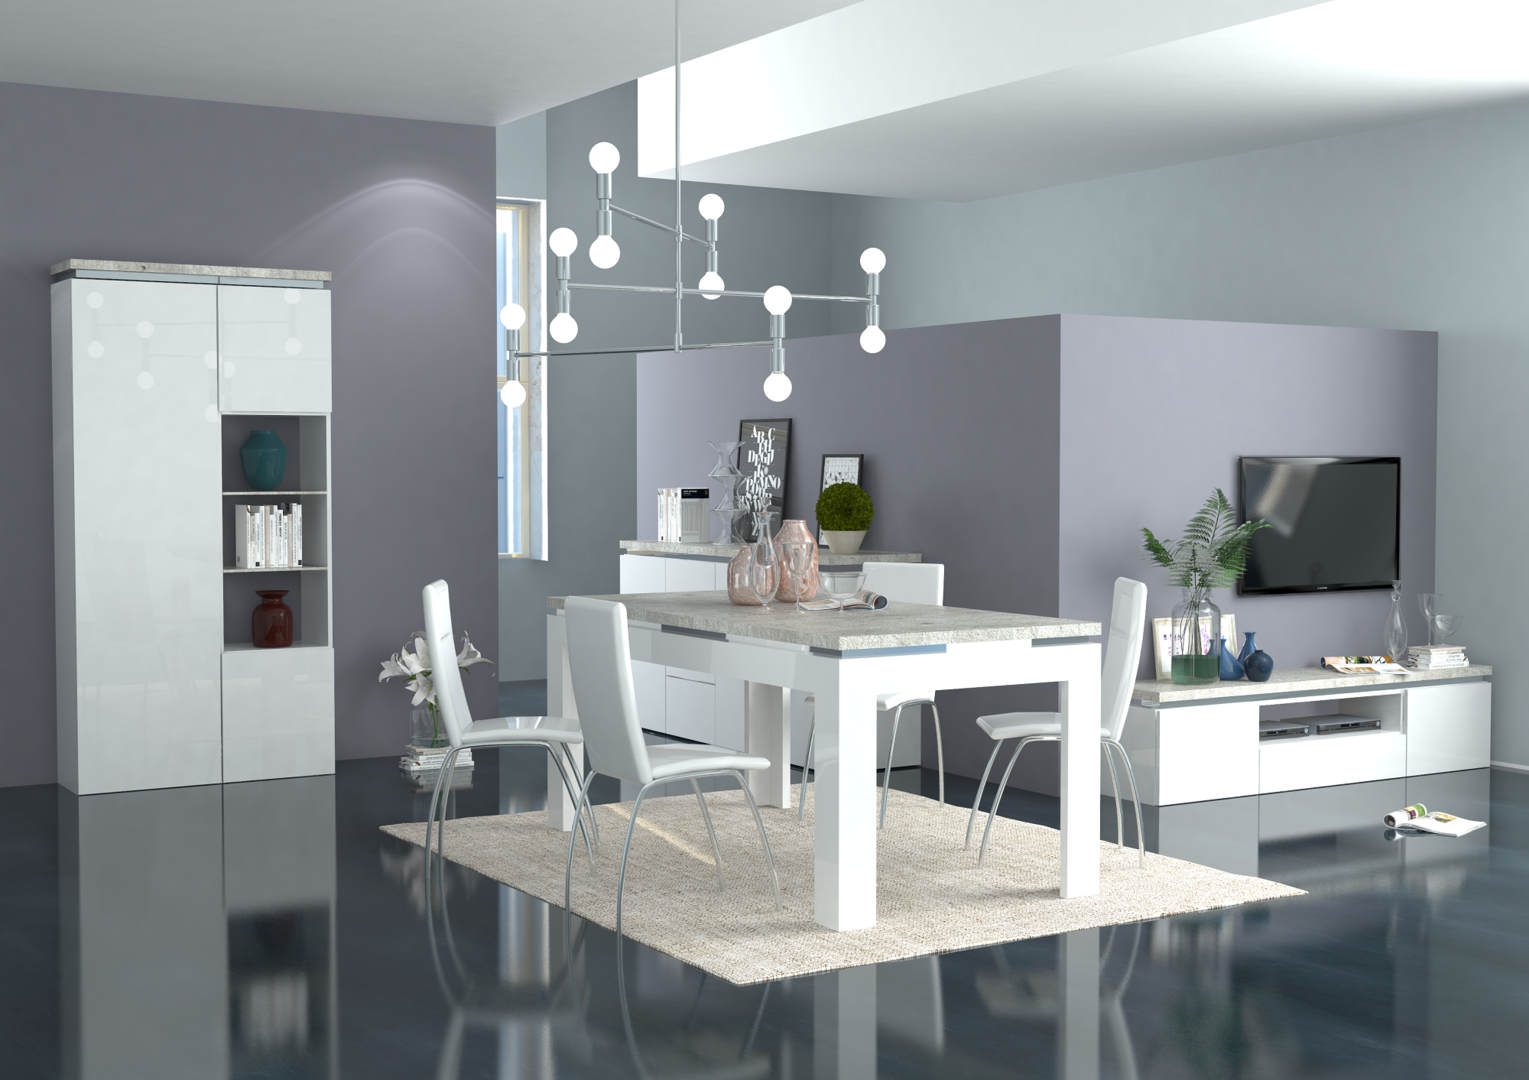 Tavolo moderno bianco messico mobile per sala da pranzo for Mobili sala pranzo